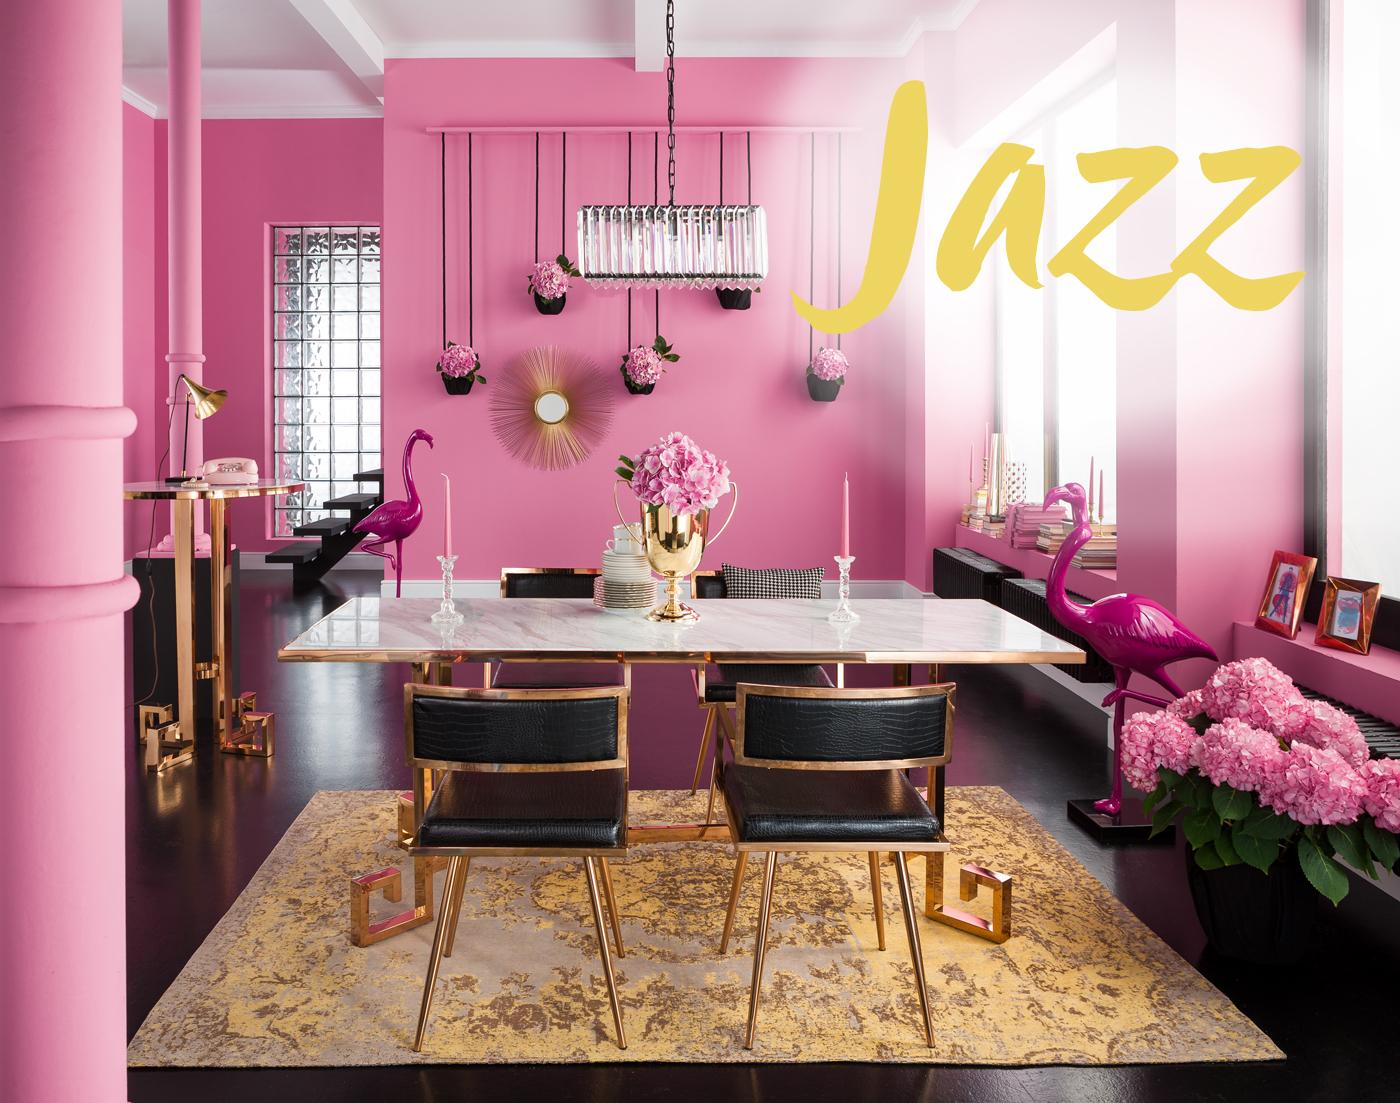 1_jazz1